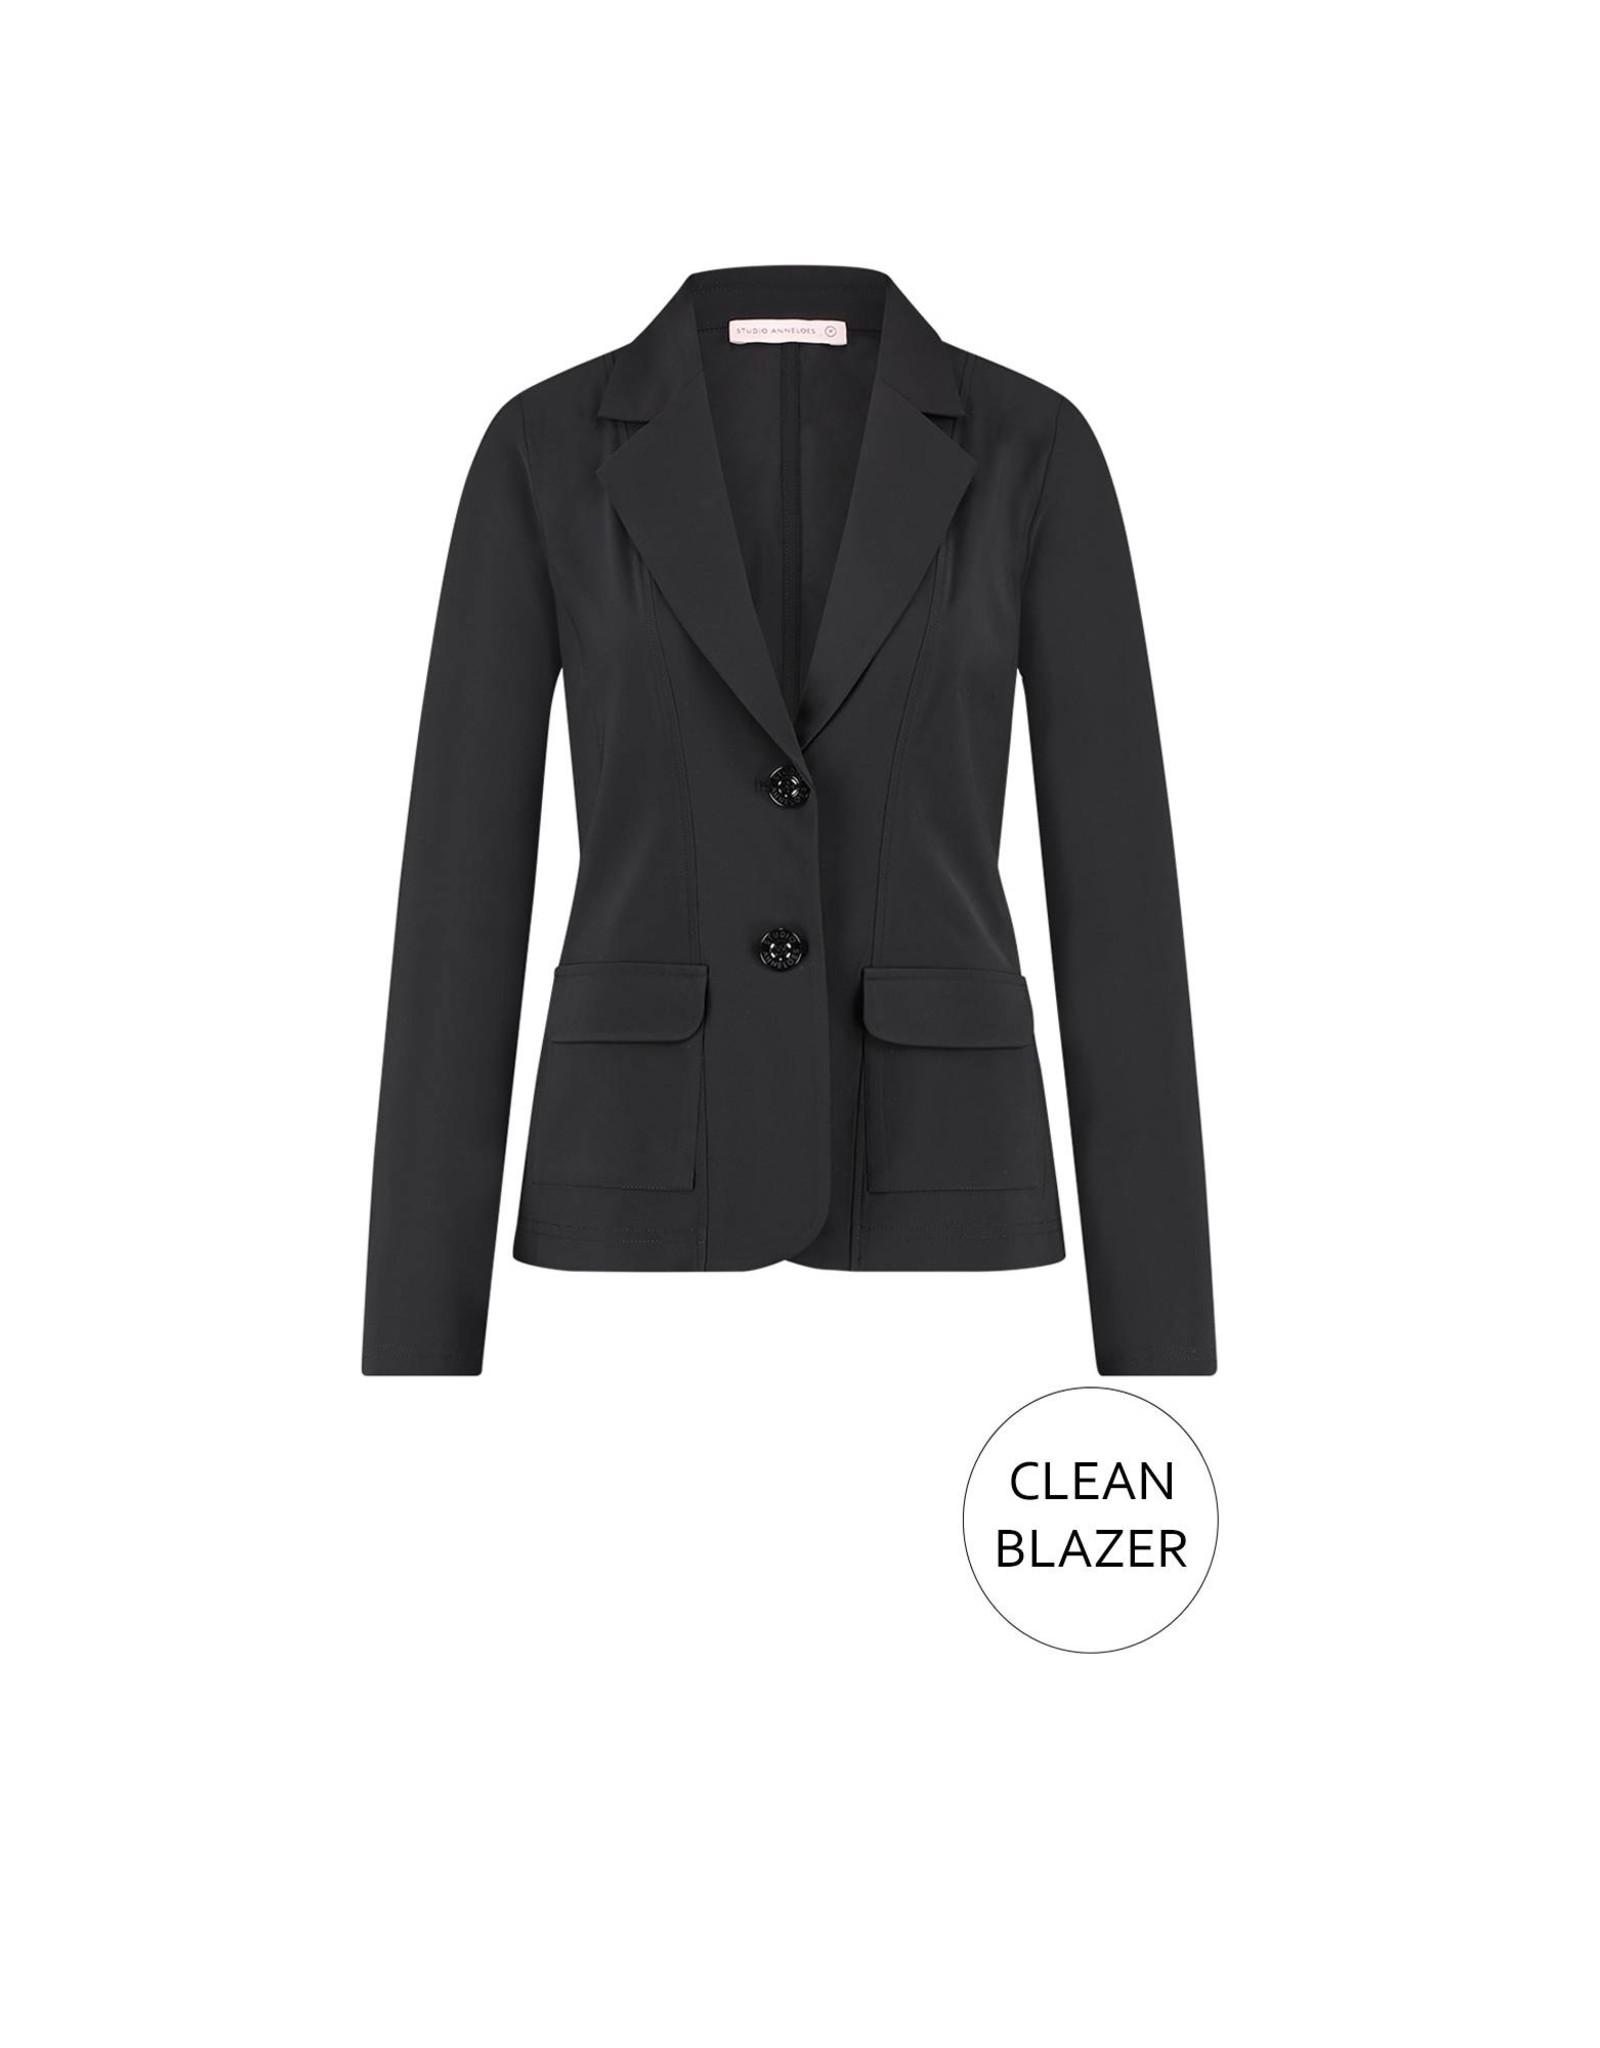 Studio Anneloes Studio anneloes clean blazer 92723